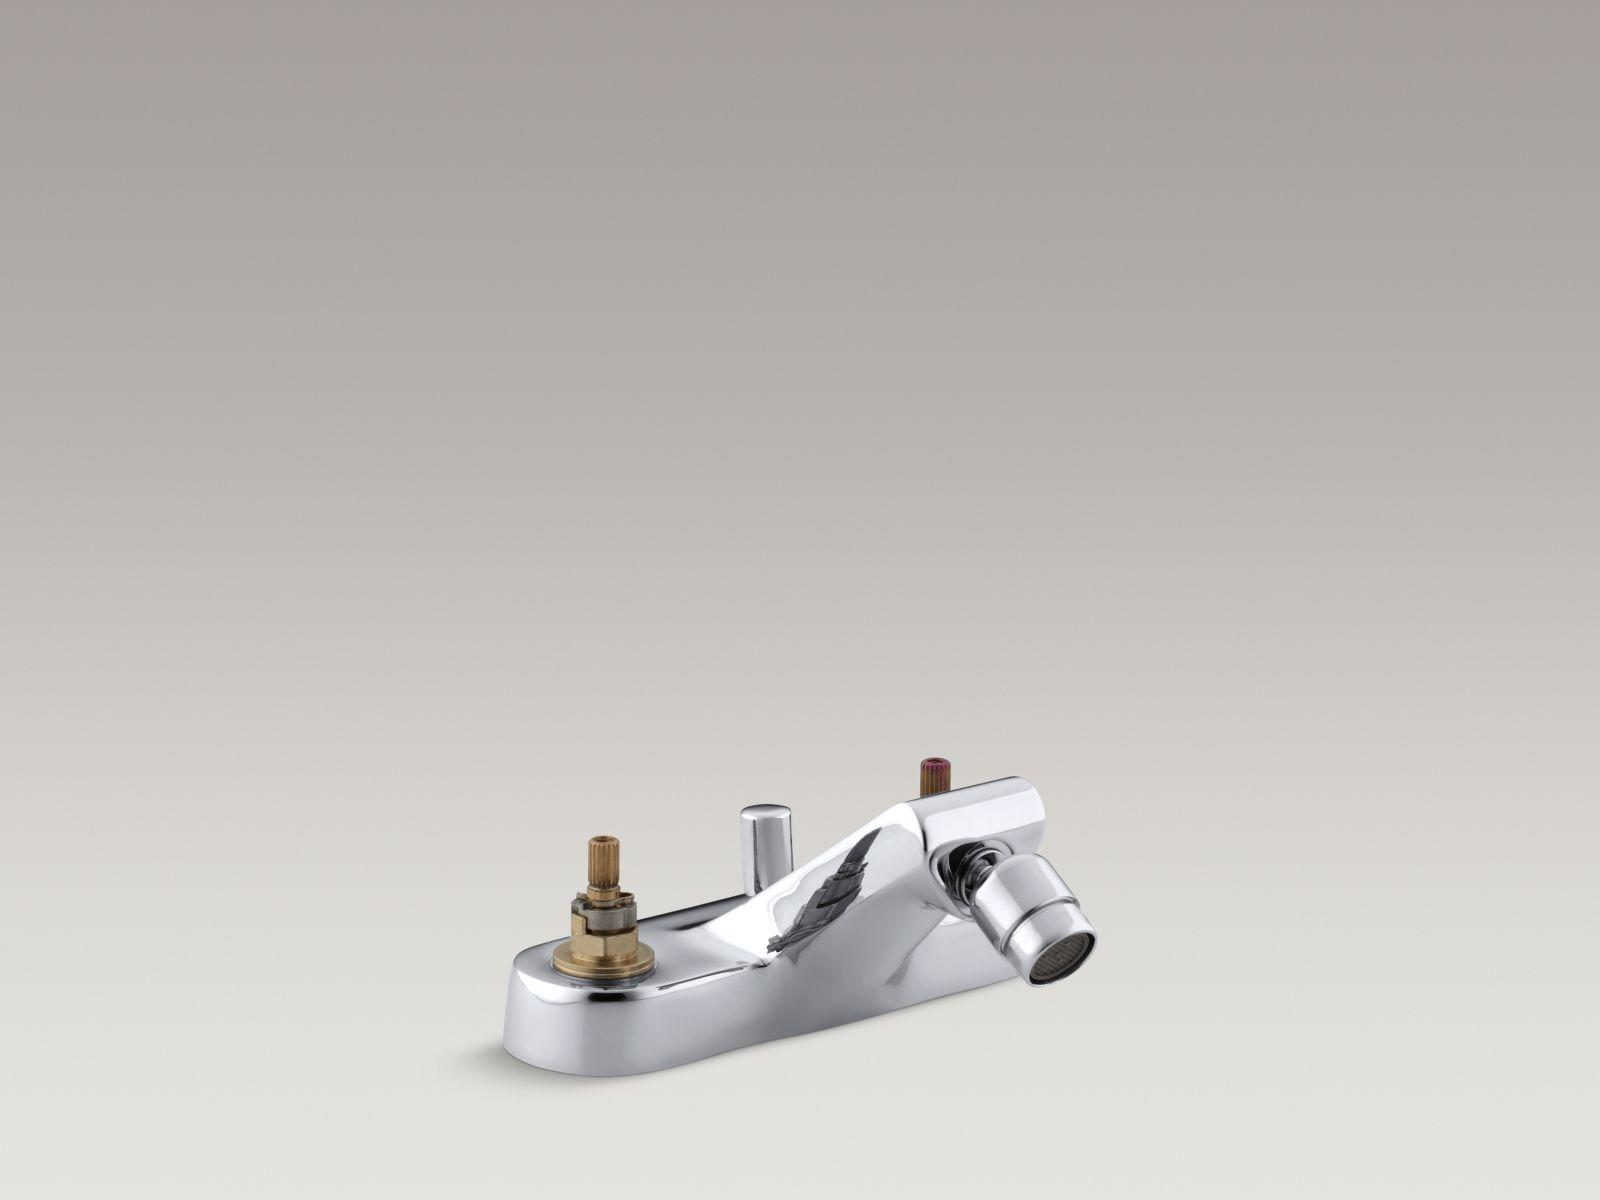 Ideas, kohler taboret sink faucet kohler taboret sink faucet standard plumbing supply category results for bidet 1600 x 1200  .